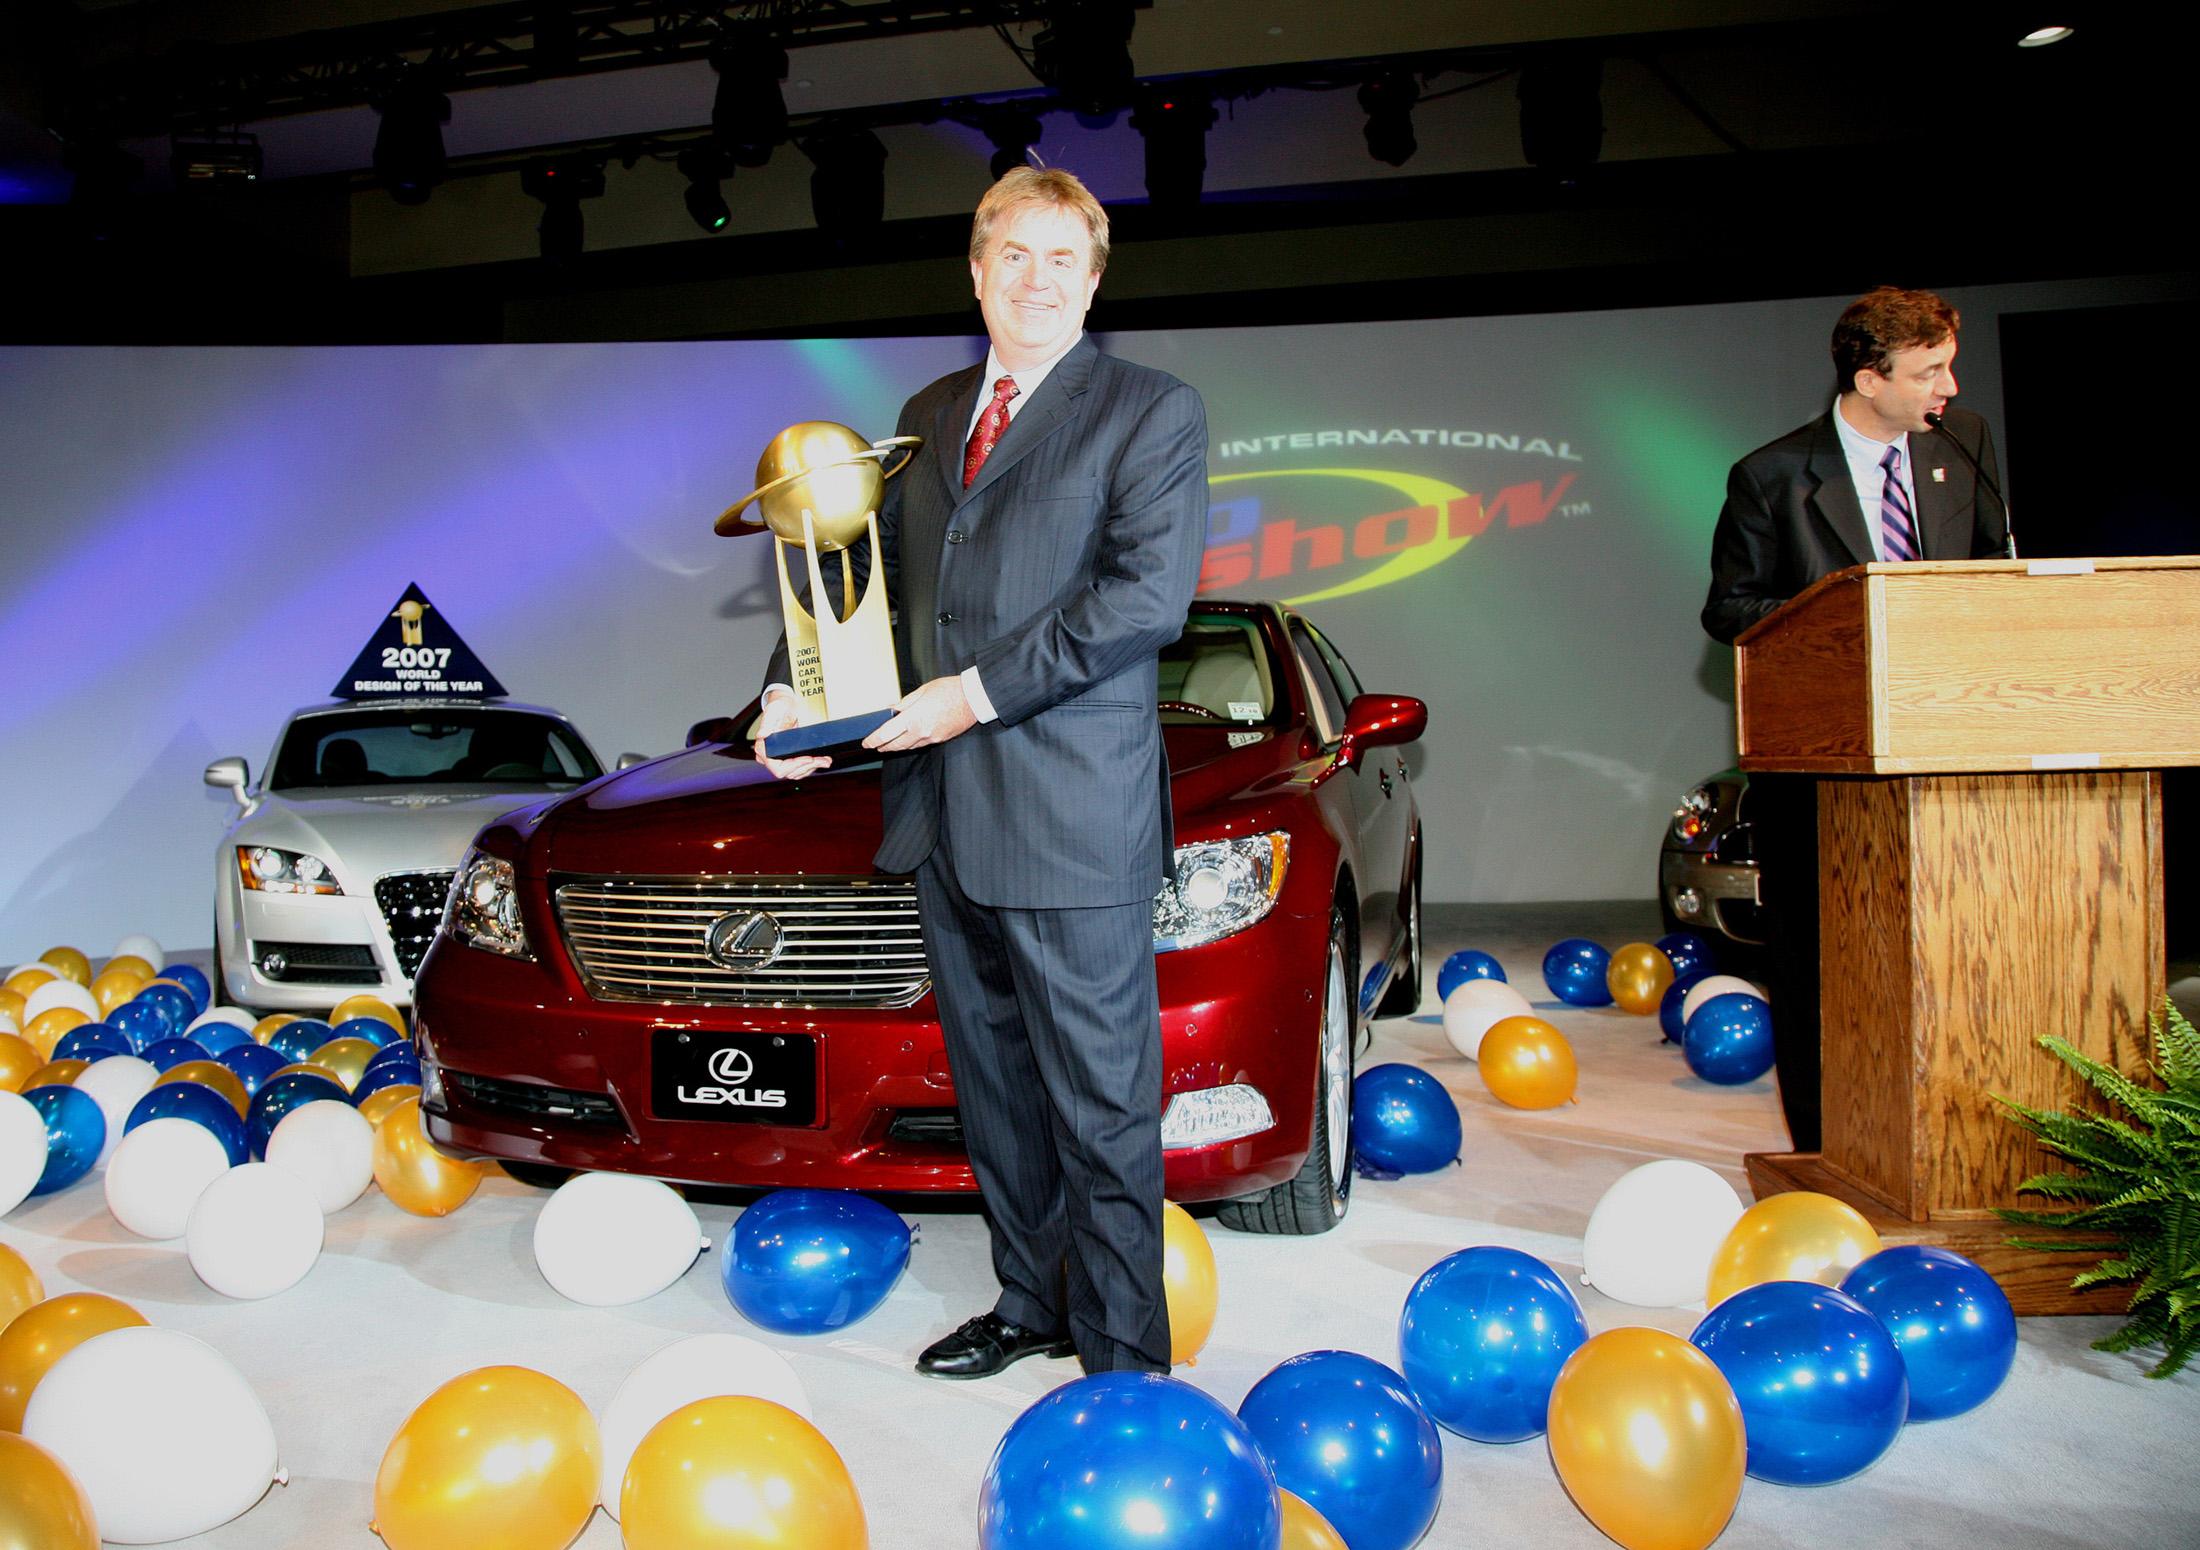 http://www.wcoty.com/upload/images/image_49_Lexus_Bob_Carter_2007_WCotY_award_LS460_b.JPG